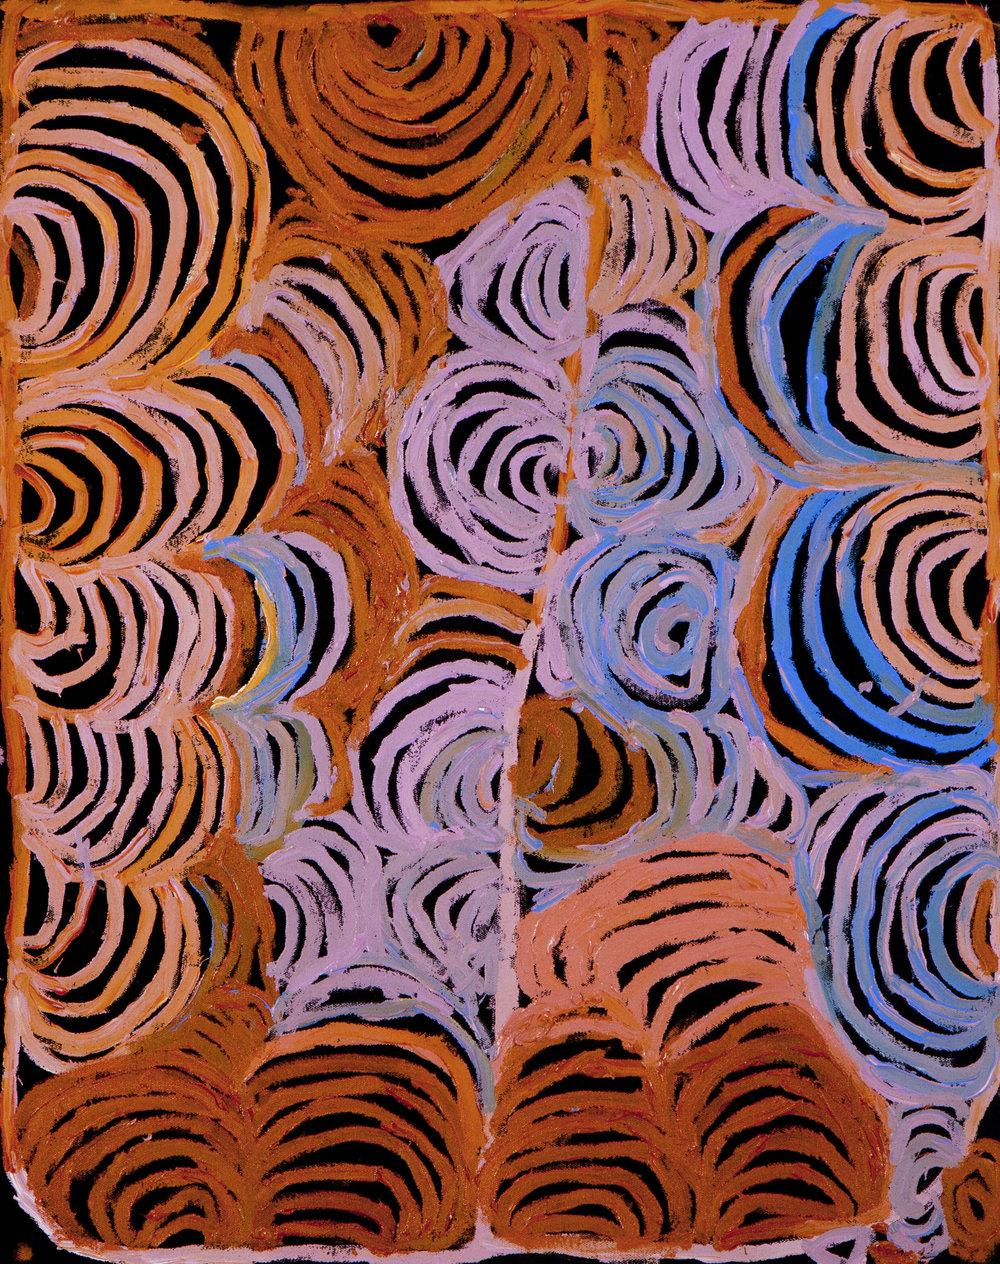 "NYARAPAYI GILES  Warmurrungu  29"" x 23.5"" (60 x 75 cm) Acrylic on Belgian linen Tjarlirli Artists catalog #12-253   EMAIL INQUIRY"